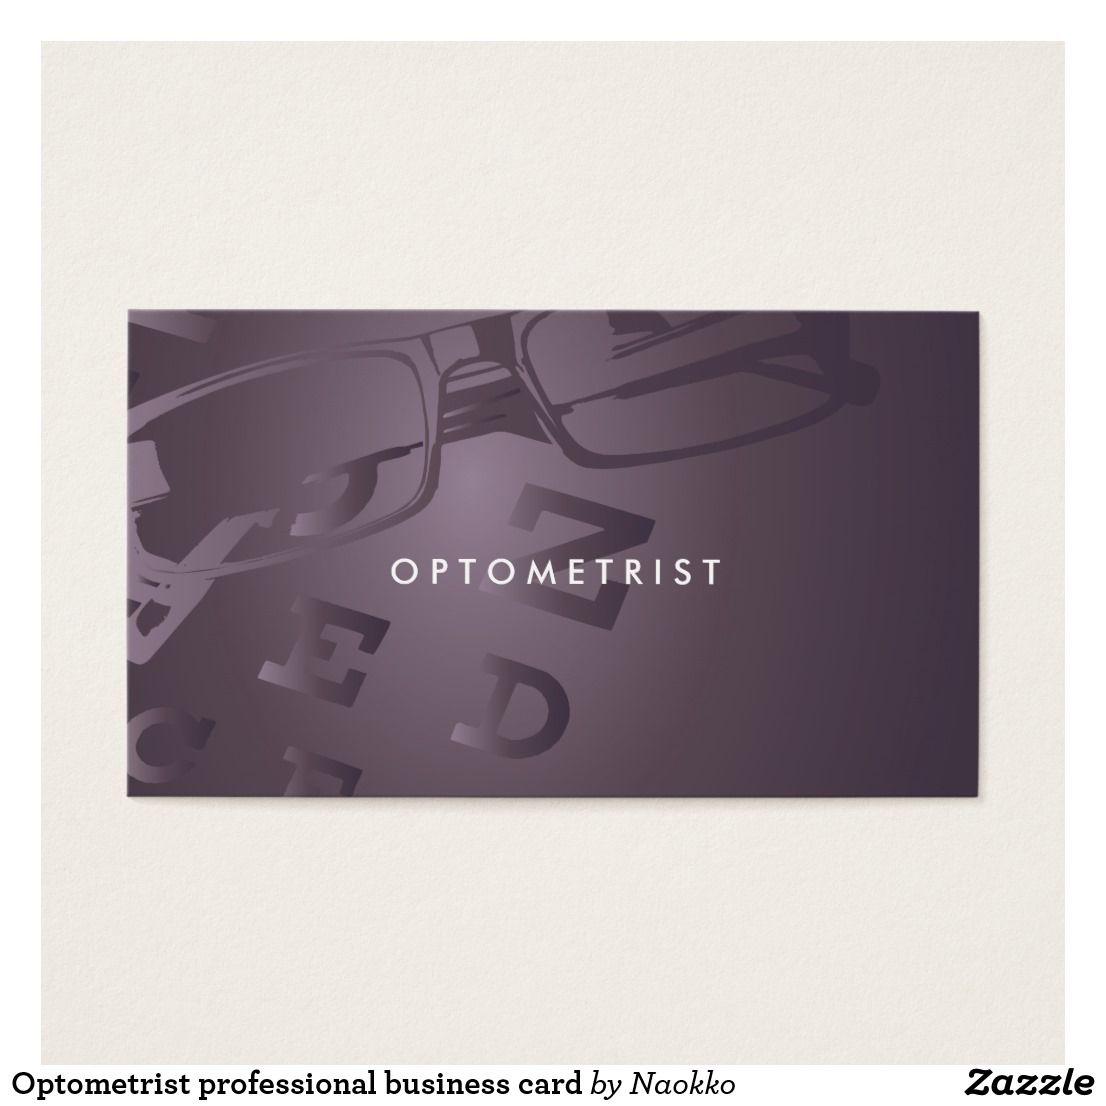 Optometrist business card | Pinterest